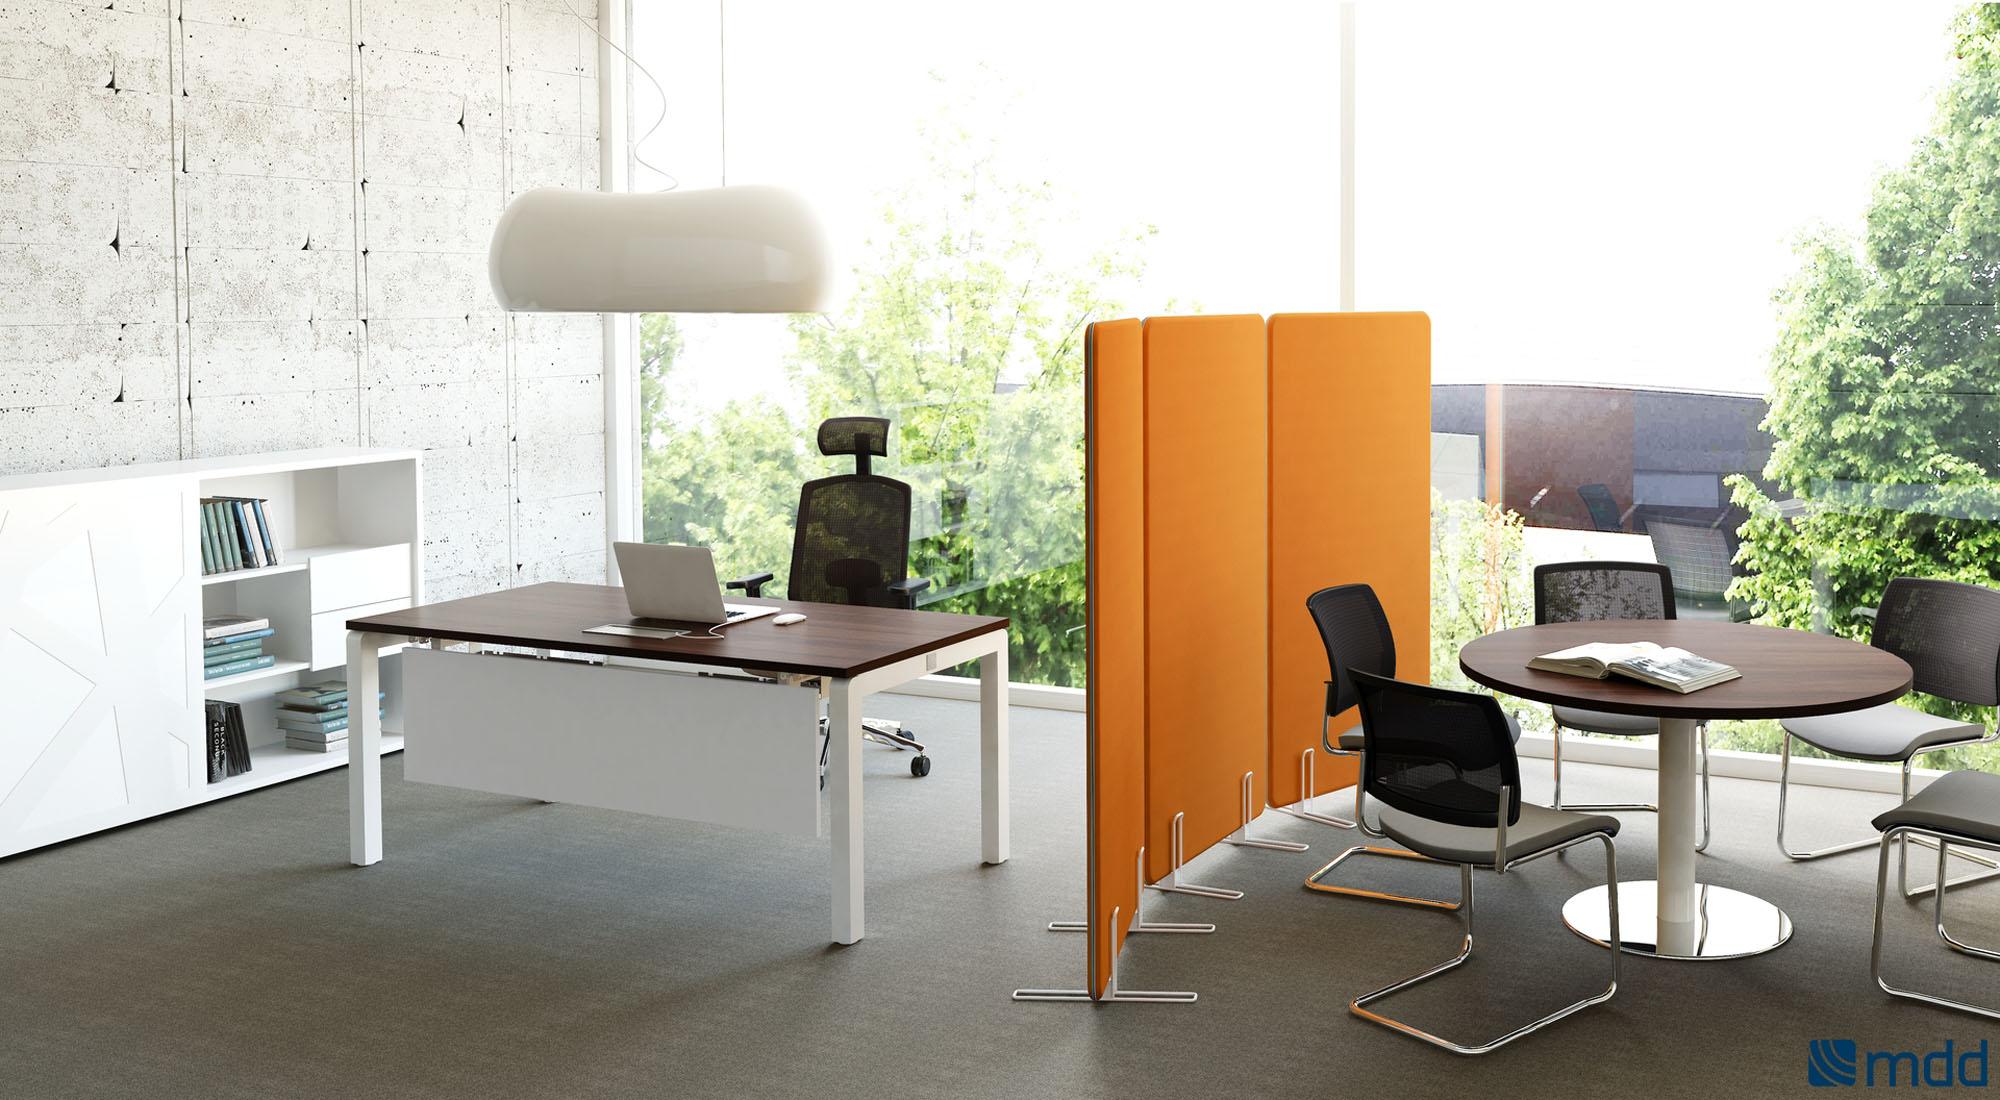 vente cloisons mobiles acoustique montpellier 34 n mes 30 s te. Black Bedroom Furniture Sets. Home Design Ideas